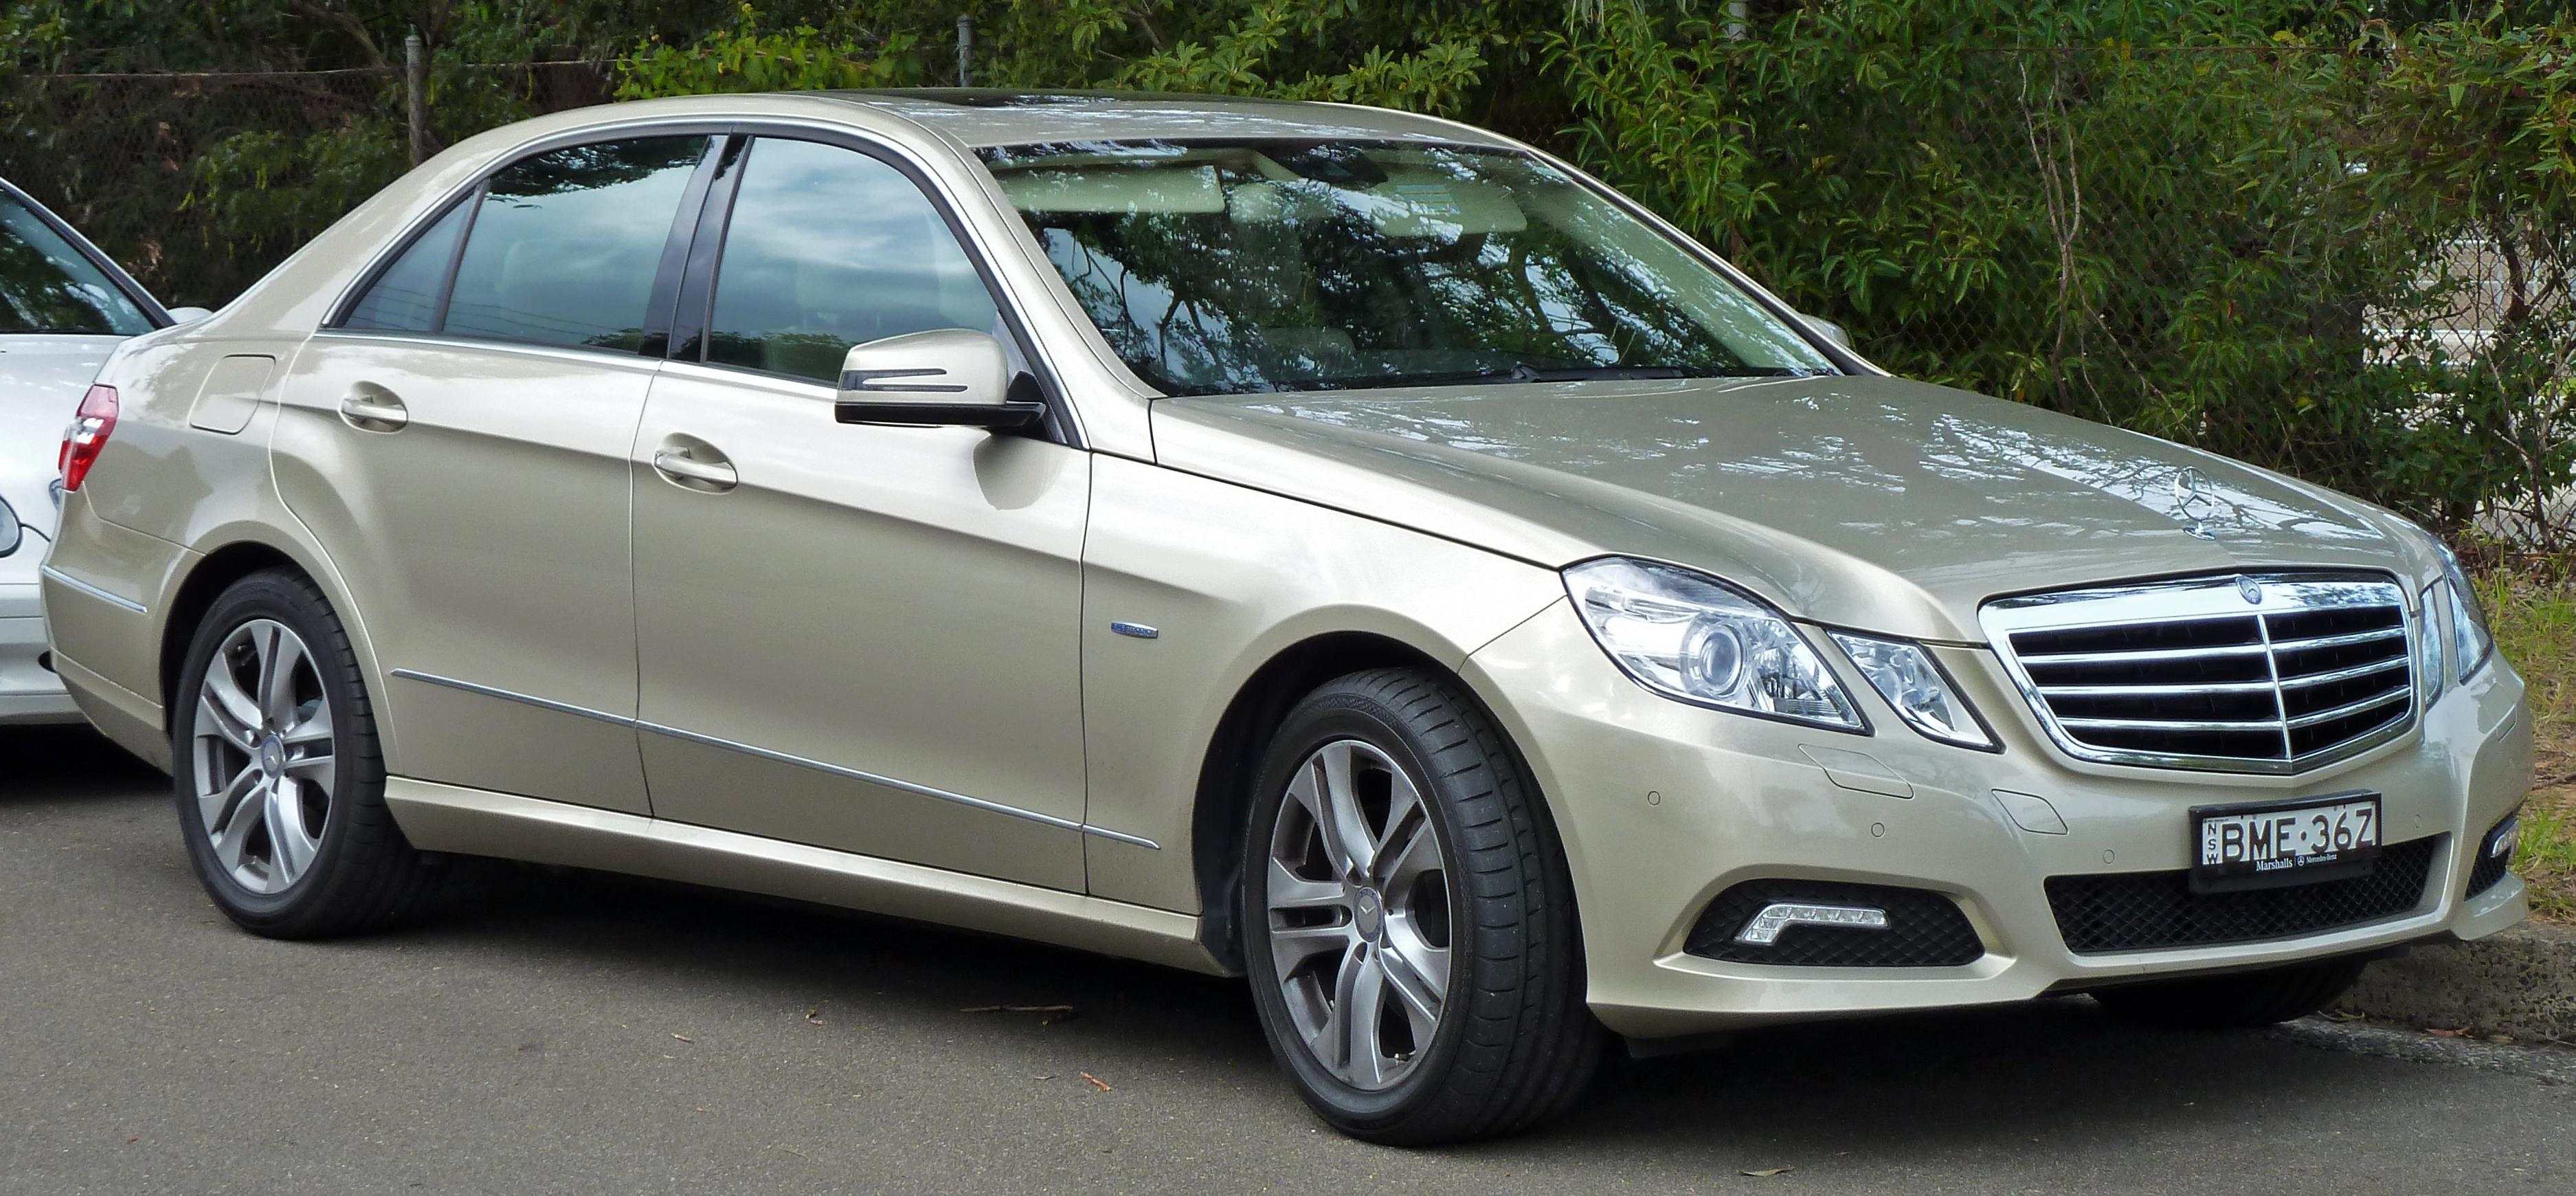 Mercedes benz e class w212 e 220 cdi 170 hp for 2009 mercedes benz e class e350 4matic review